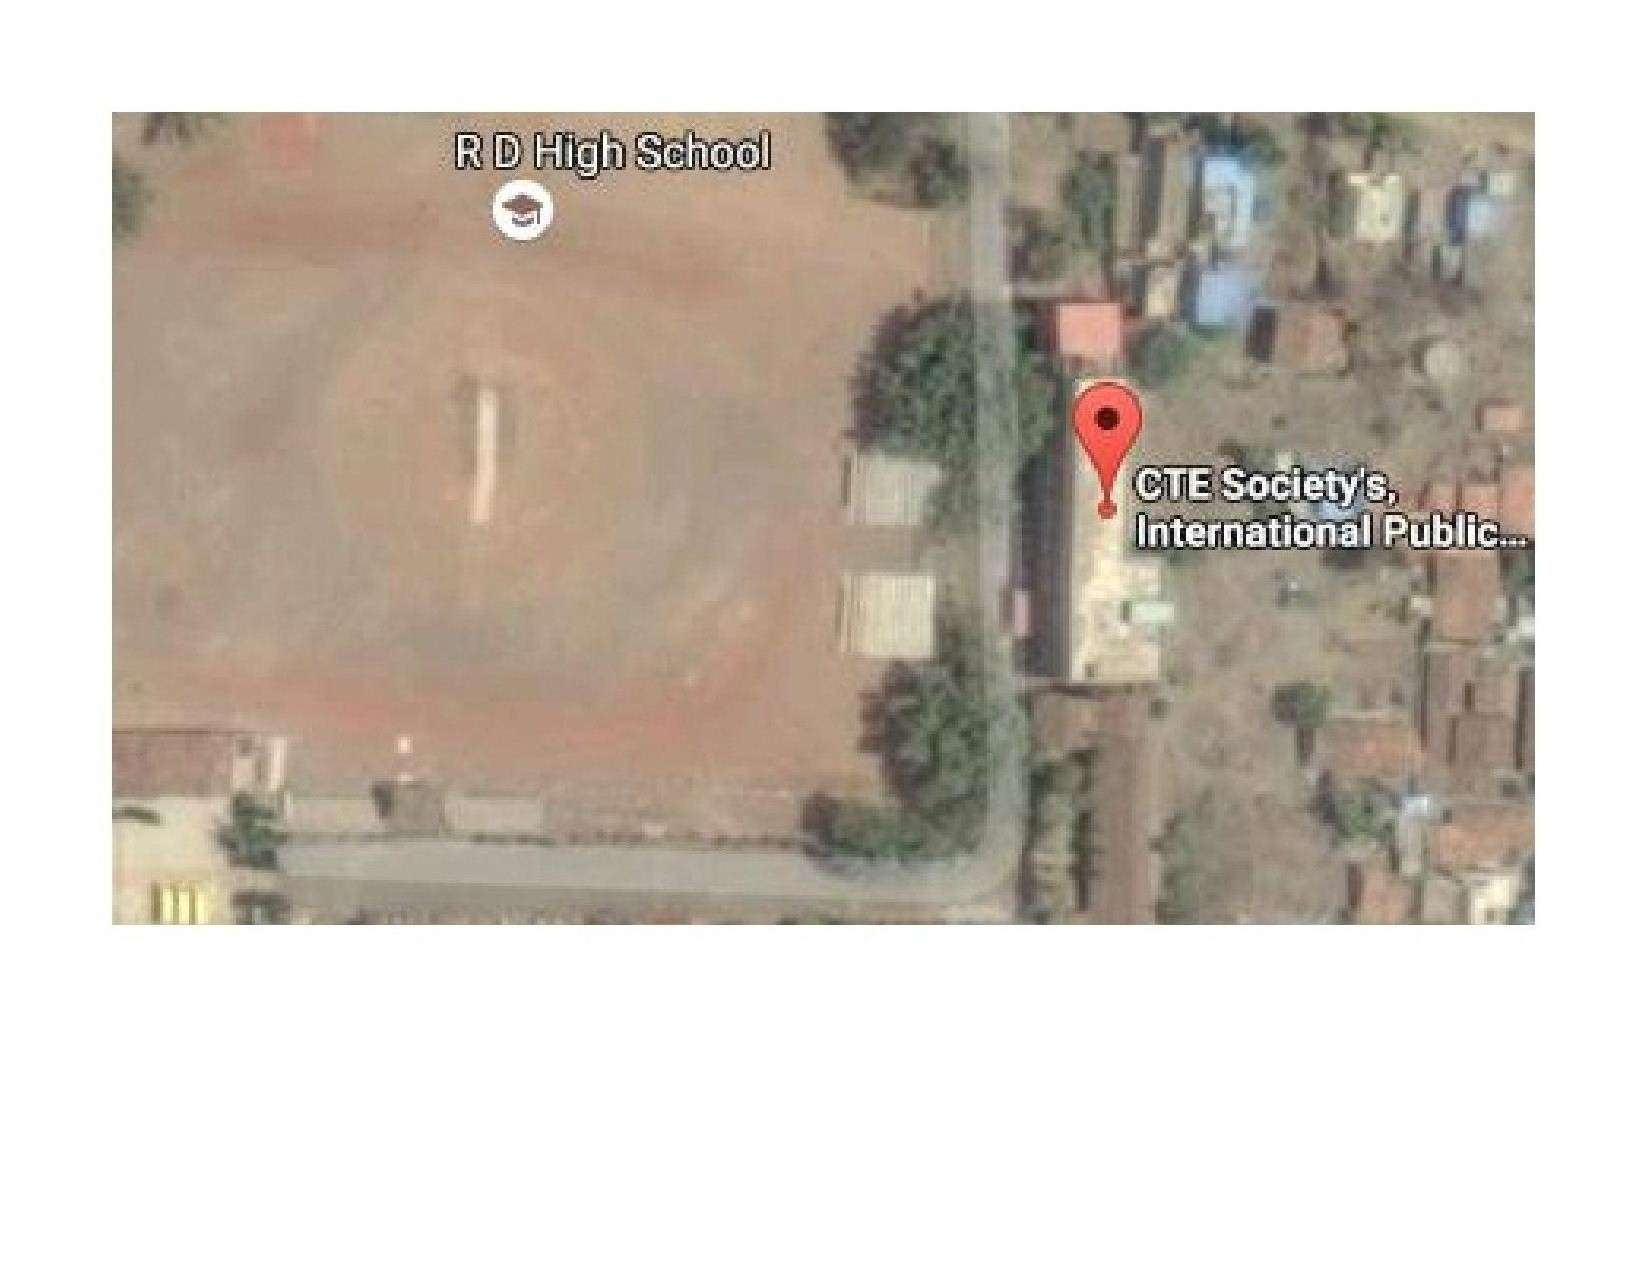 C T E Societys International Public School C T E Societys International Public School co R D High School Campus N M Road Chikodi 830422